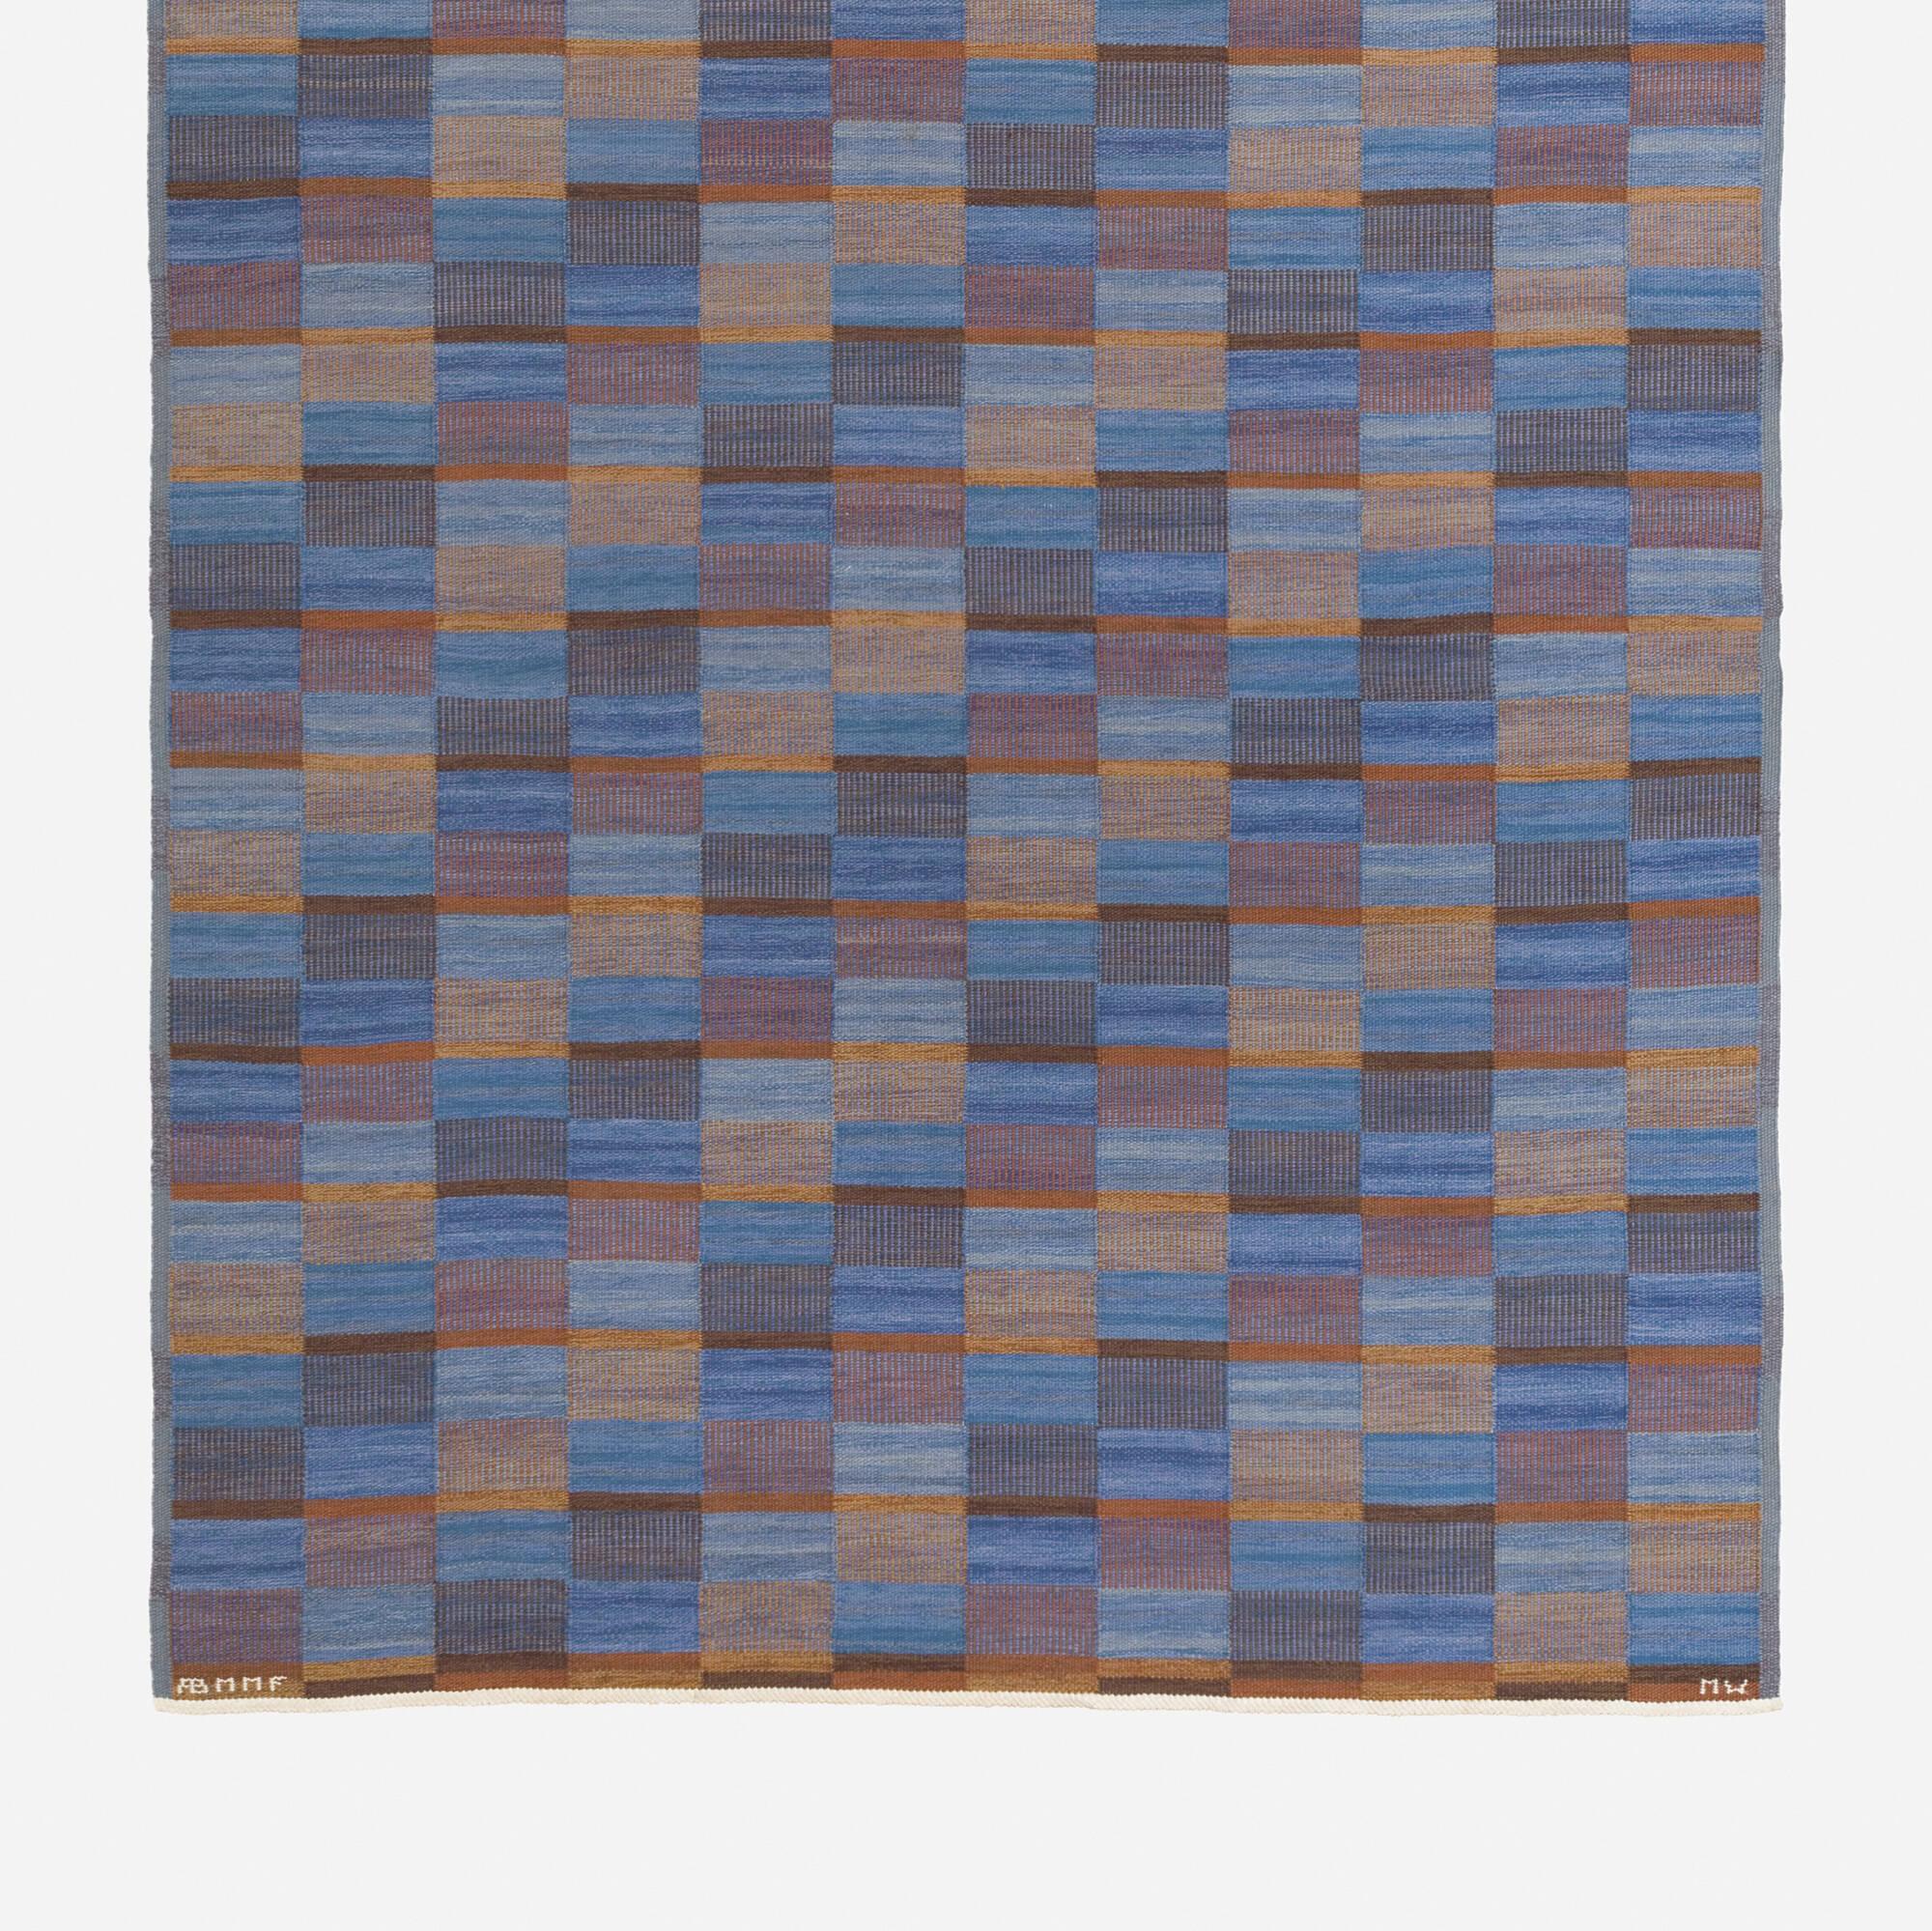 162: Mai Wellner / Slagrutan flatweave carpet (2 of 2)